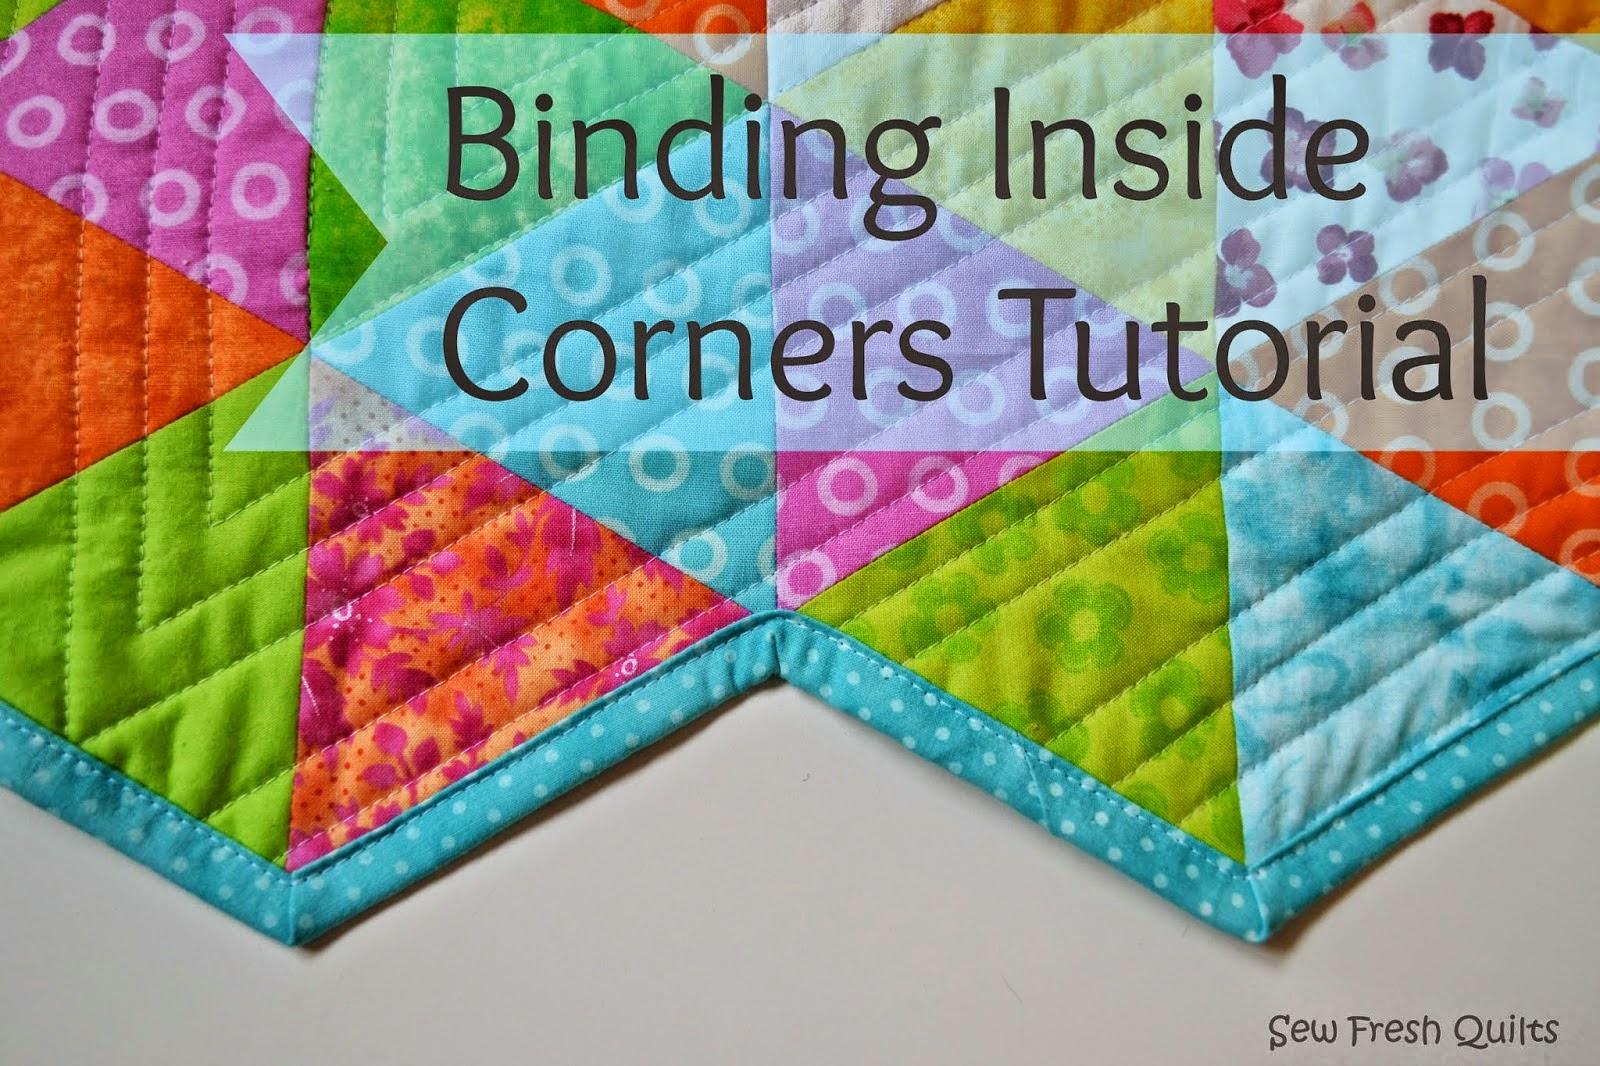 http://sewfreshquilts.blogspot.ca/2014/04/binding-inside-corners-tutorial.html